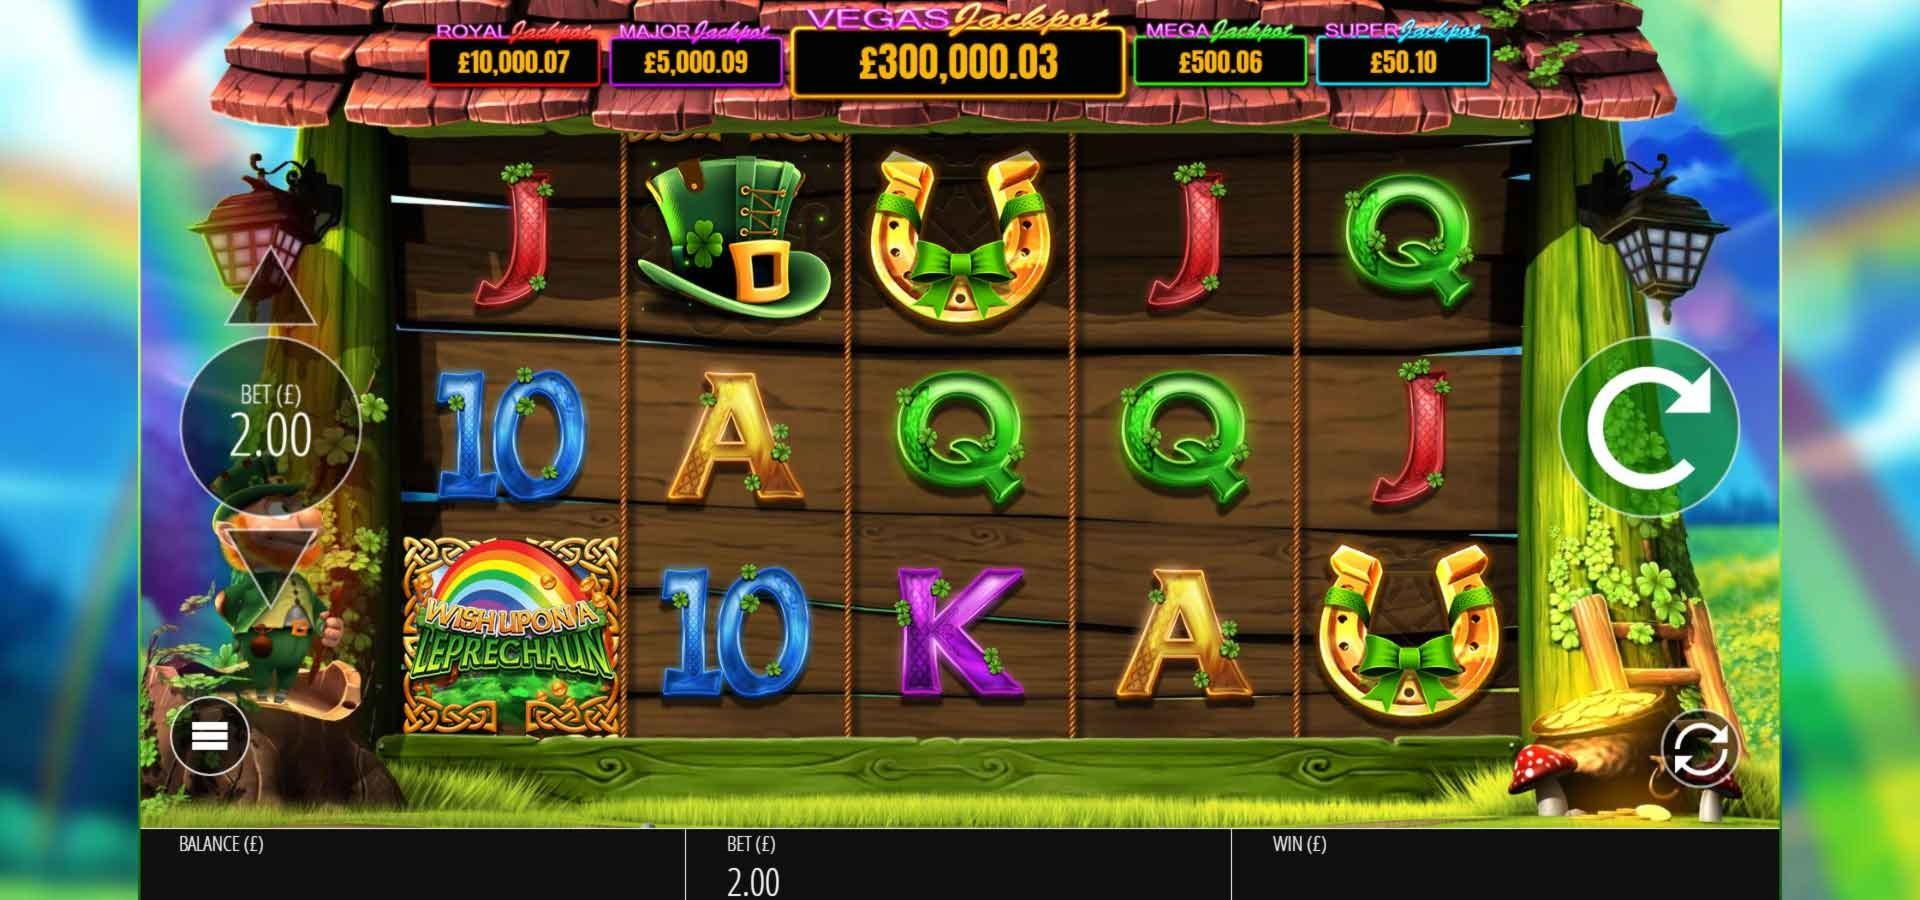 720 Match Bonus At Treasure Island Jackpots (Sloto Cash